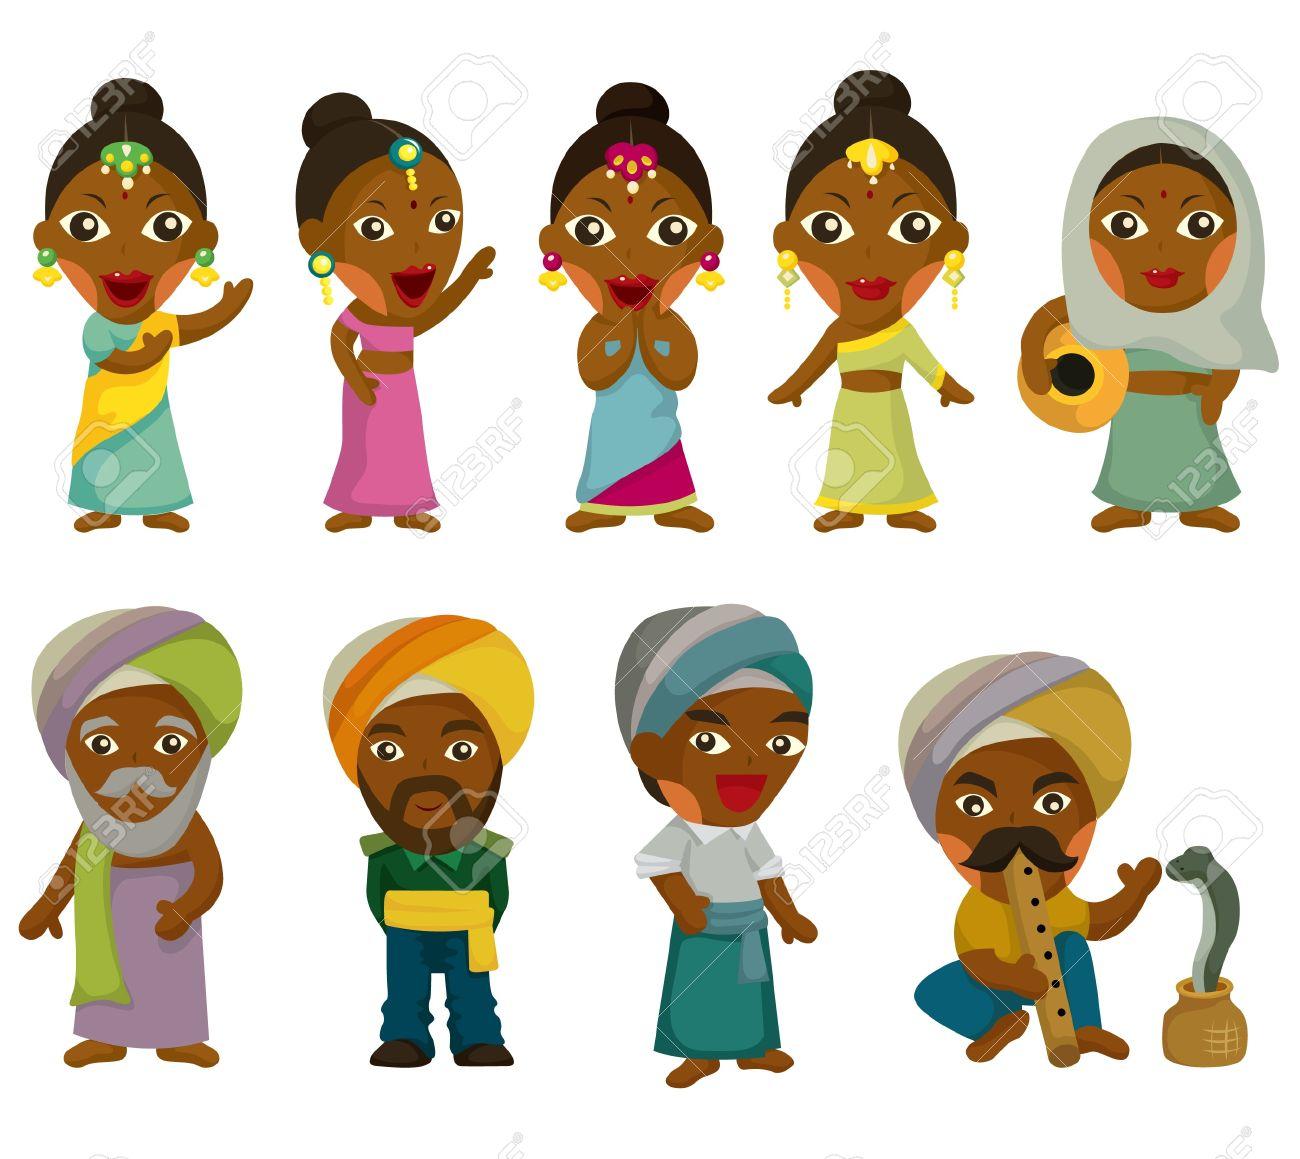 Vector Of Cartoon Indian Icon Set Royalty Free Cliparts, Vectors ...